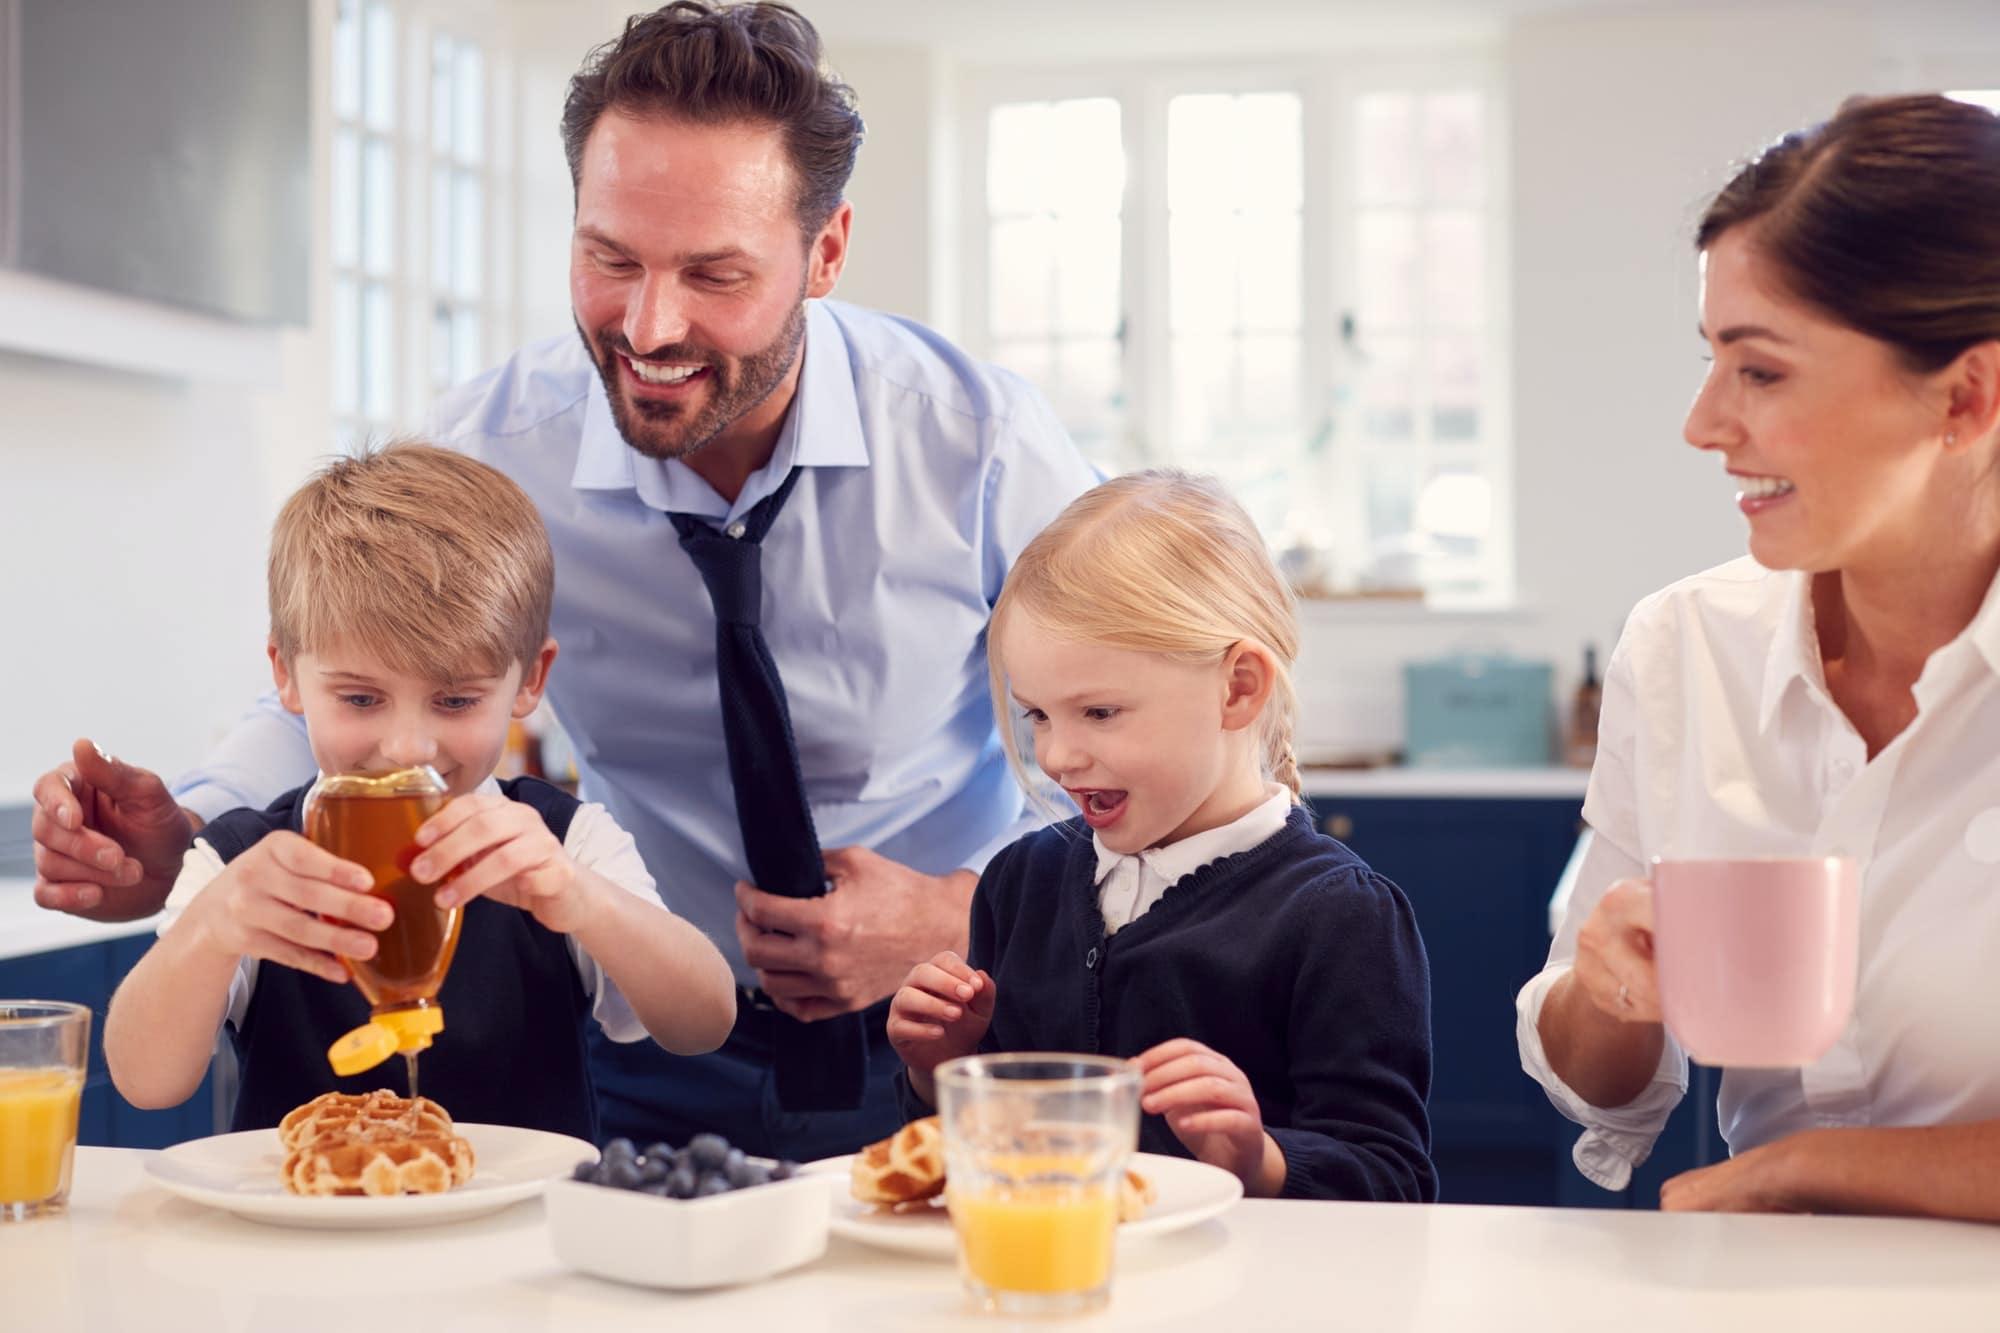 Children Wearing School Uniform In Kitchen Eating Breakfast Waffles As Parents Get Ready For Work